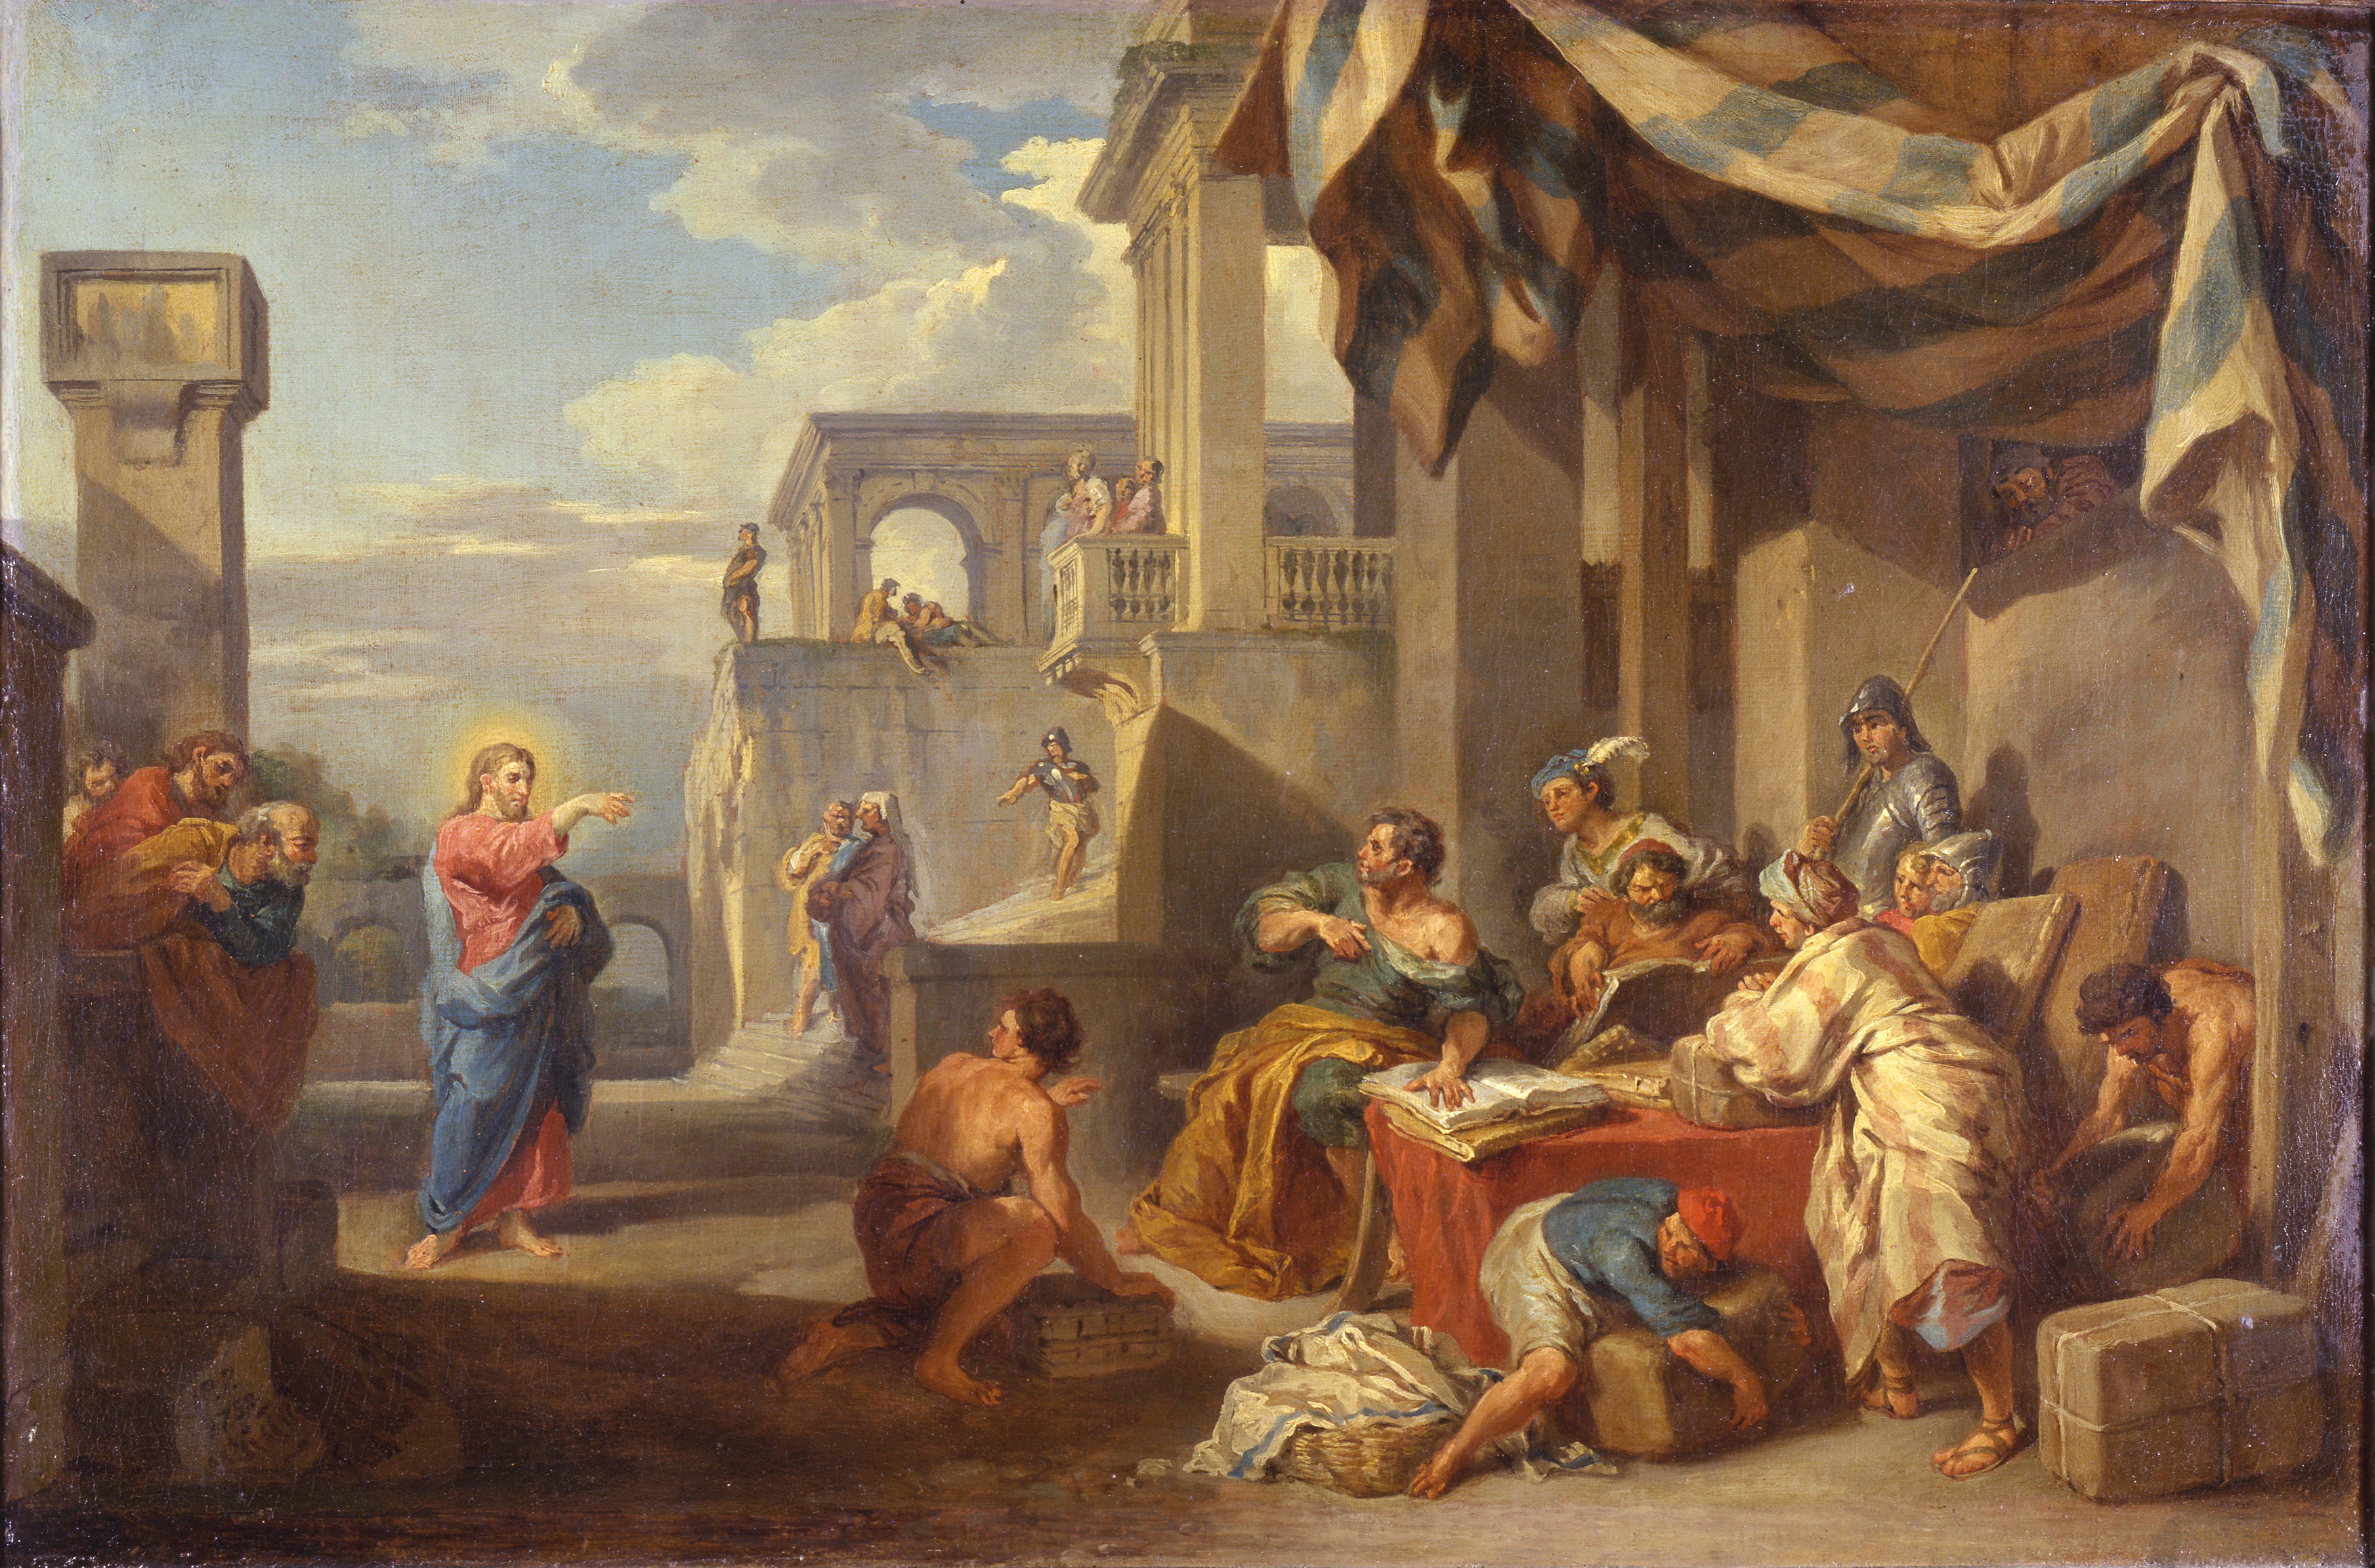 Giovanni_Paolo_Panini_-_The_Calling_of_Saint_Matthew_-_Google_Art_Project